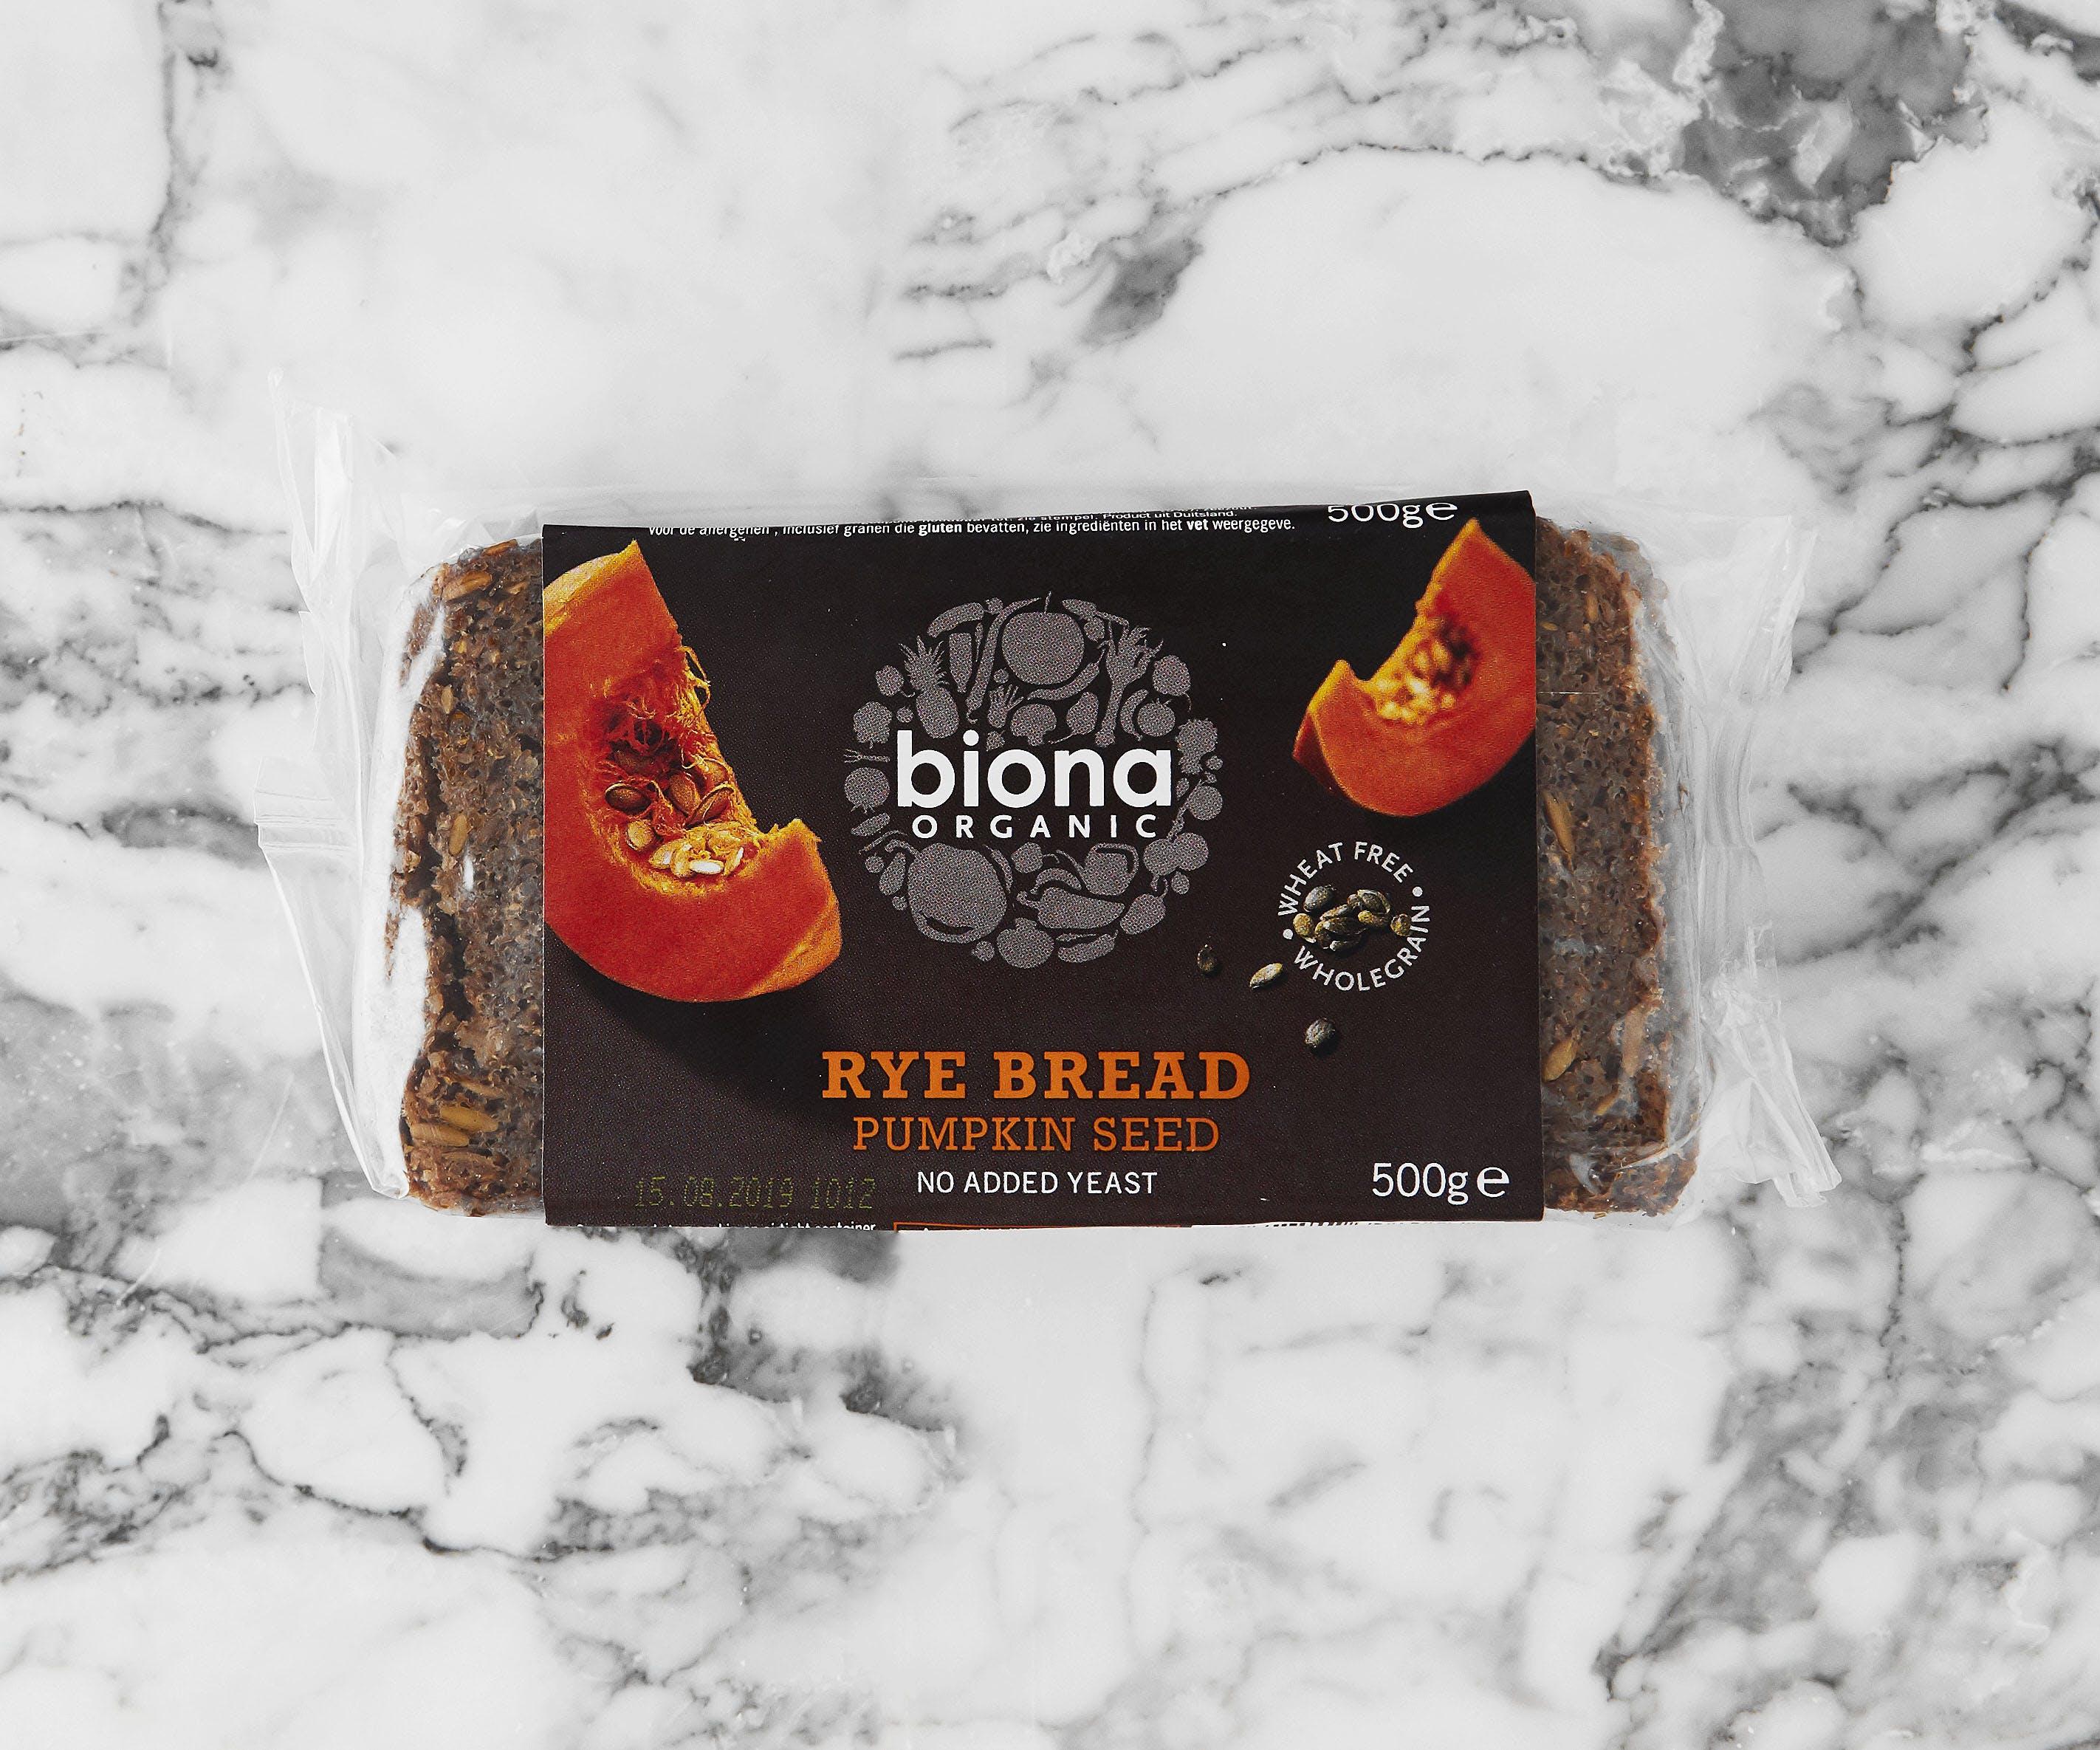 Organic Rye Bread - Pumpkin Seed